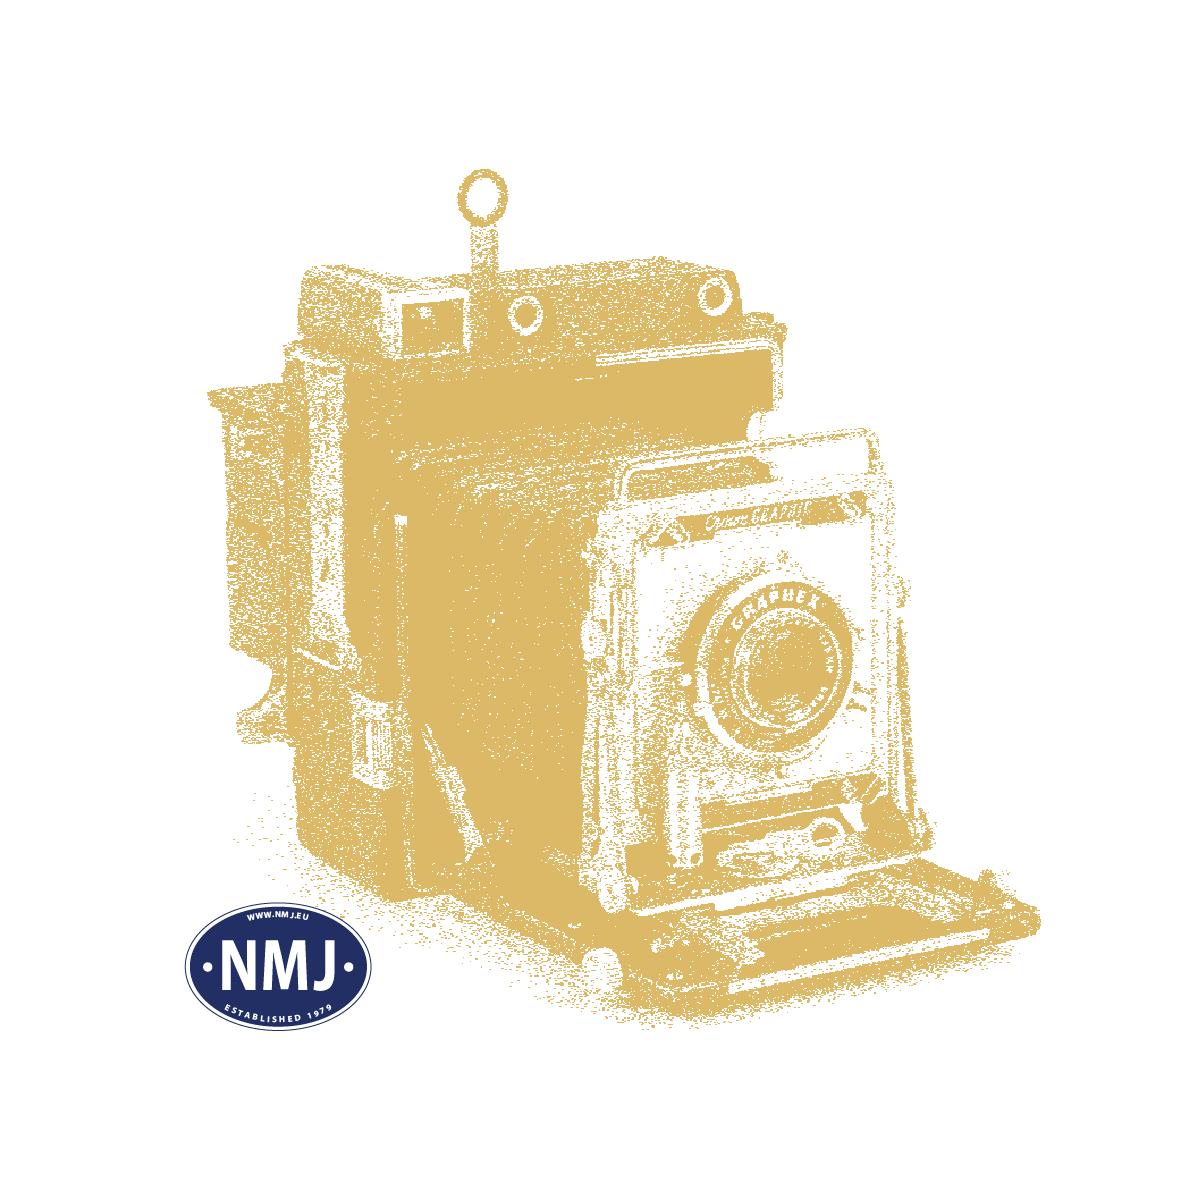 NMJT93104 - NMJ Topline NSB El14 2169, Nydesign, DC